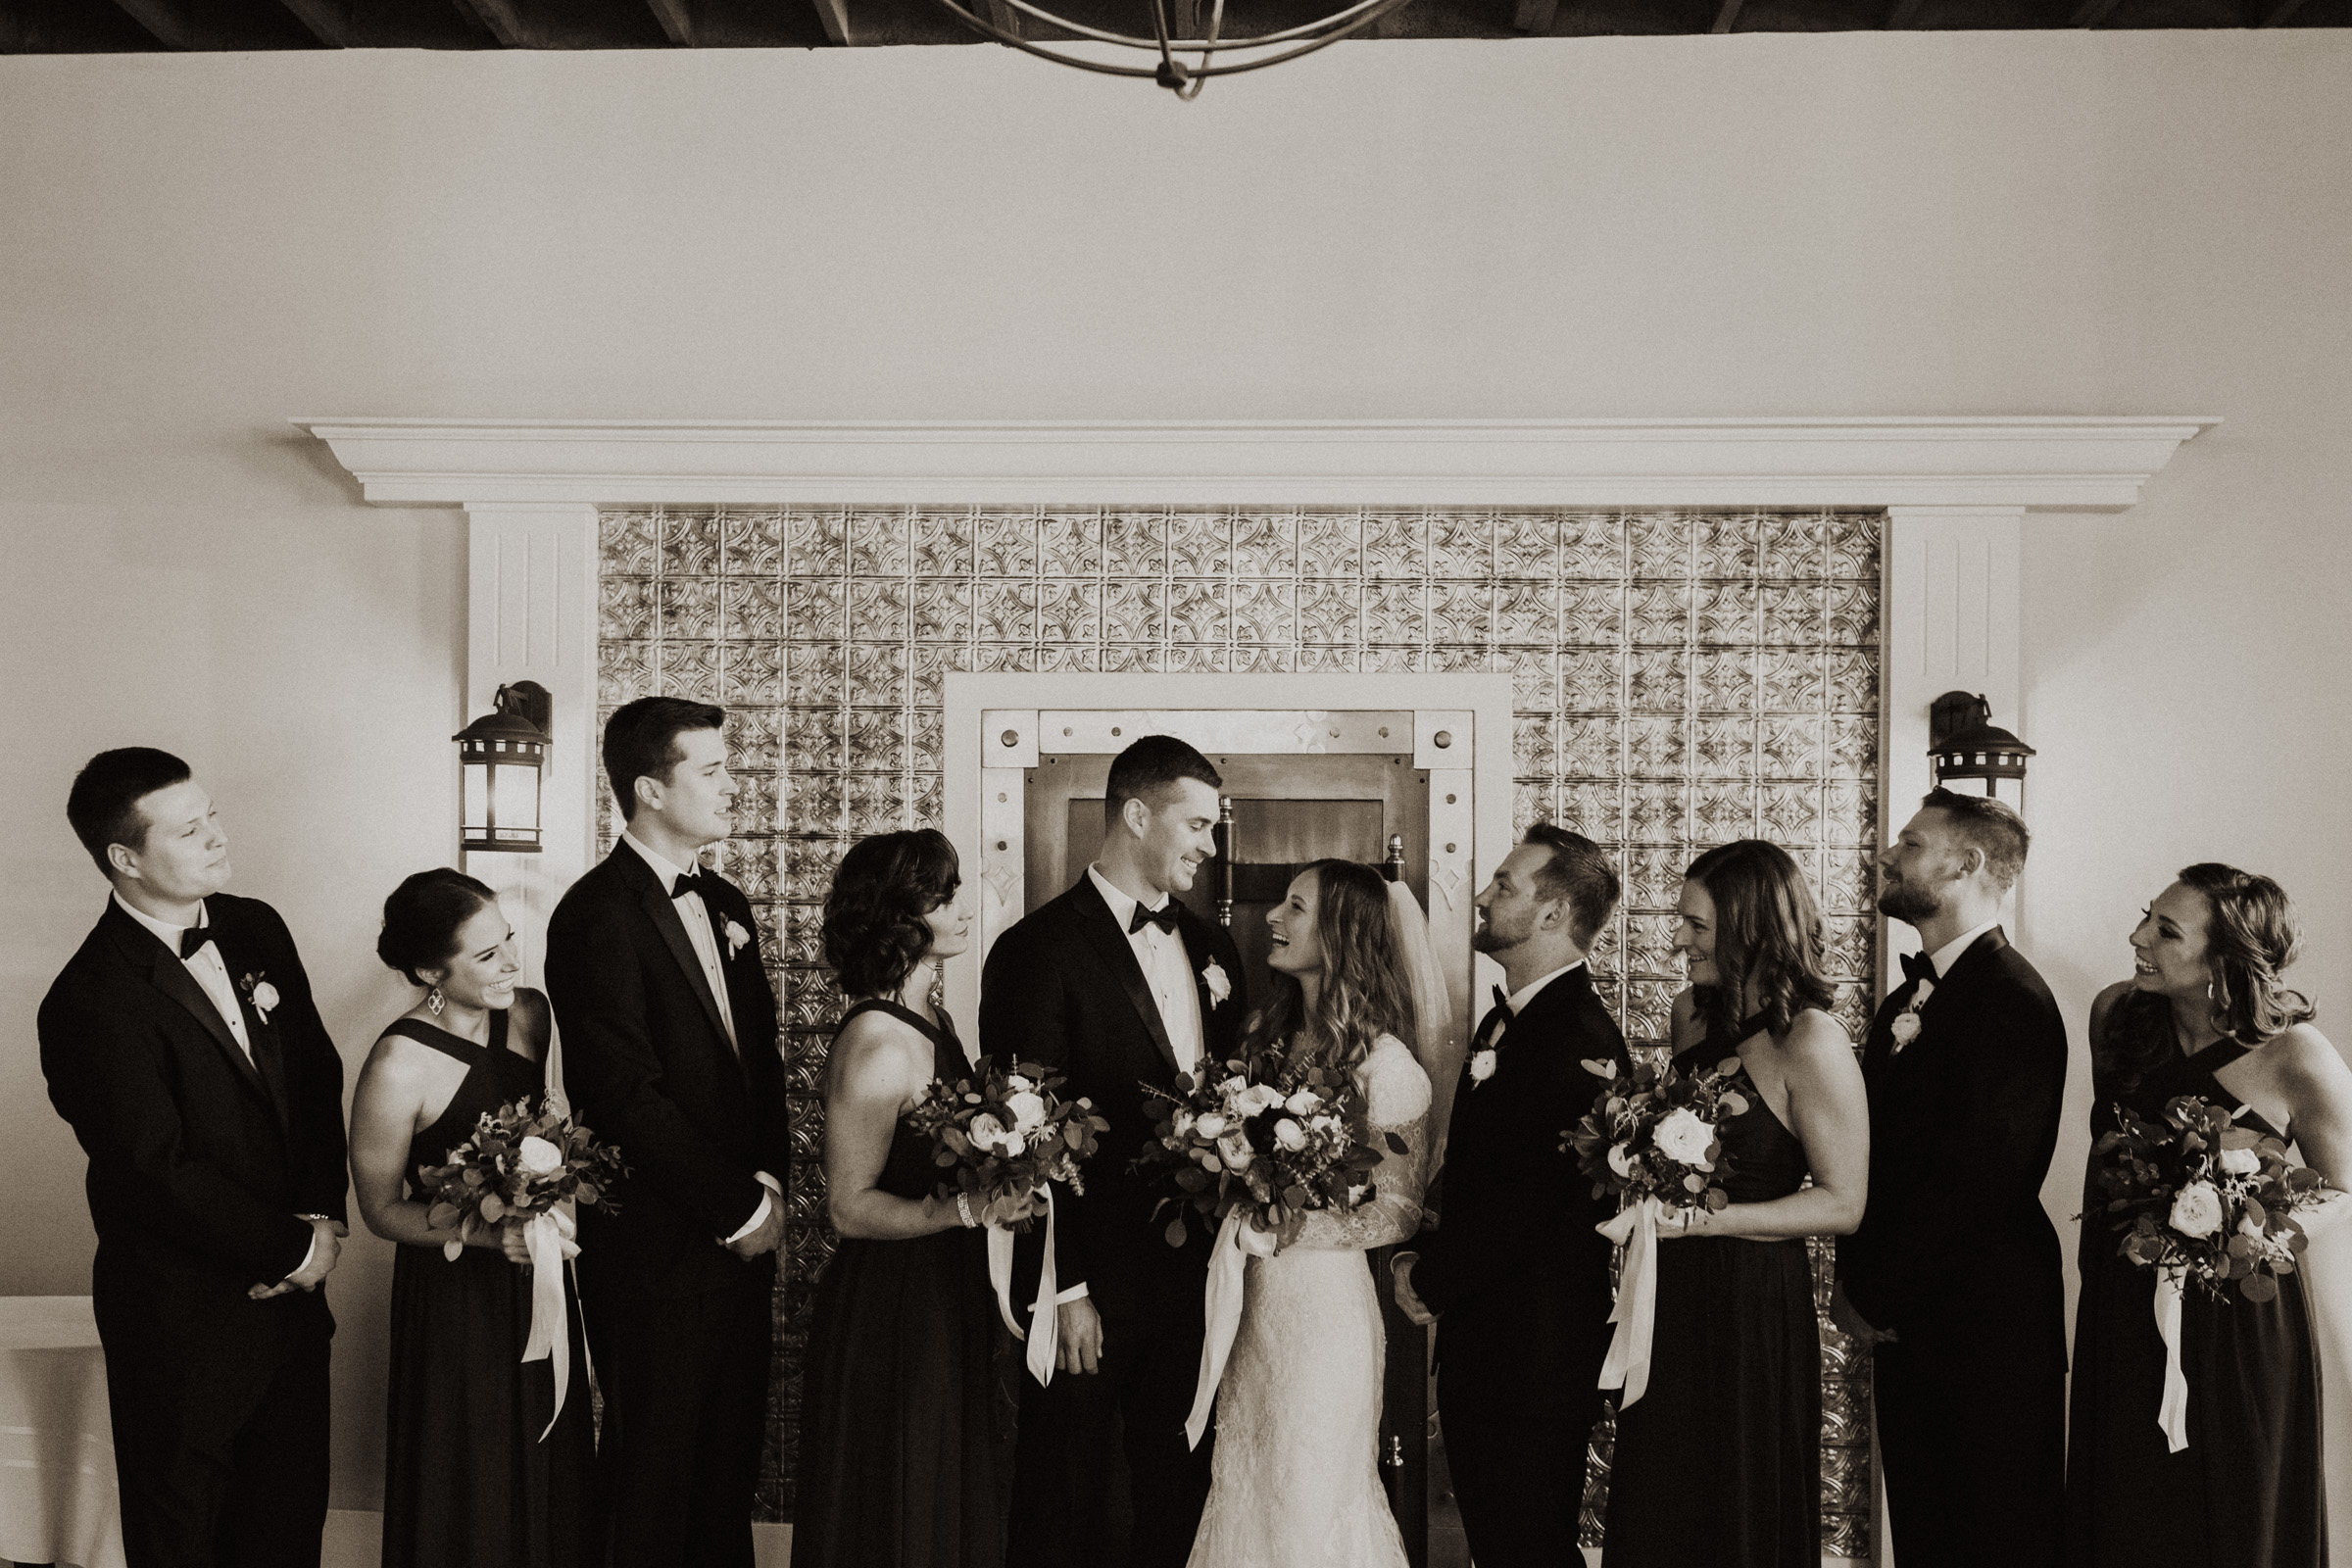 alyssa barletter photography shawnee mission park winter wedding 8th and main grandview missouri photographer-42.jpg